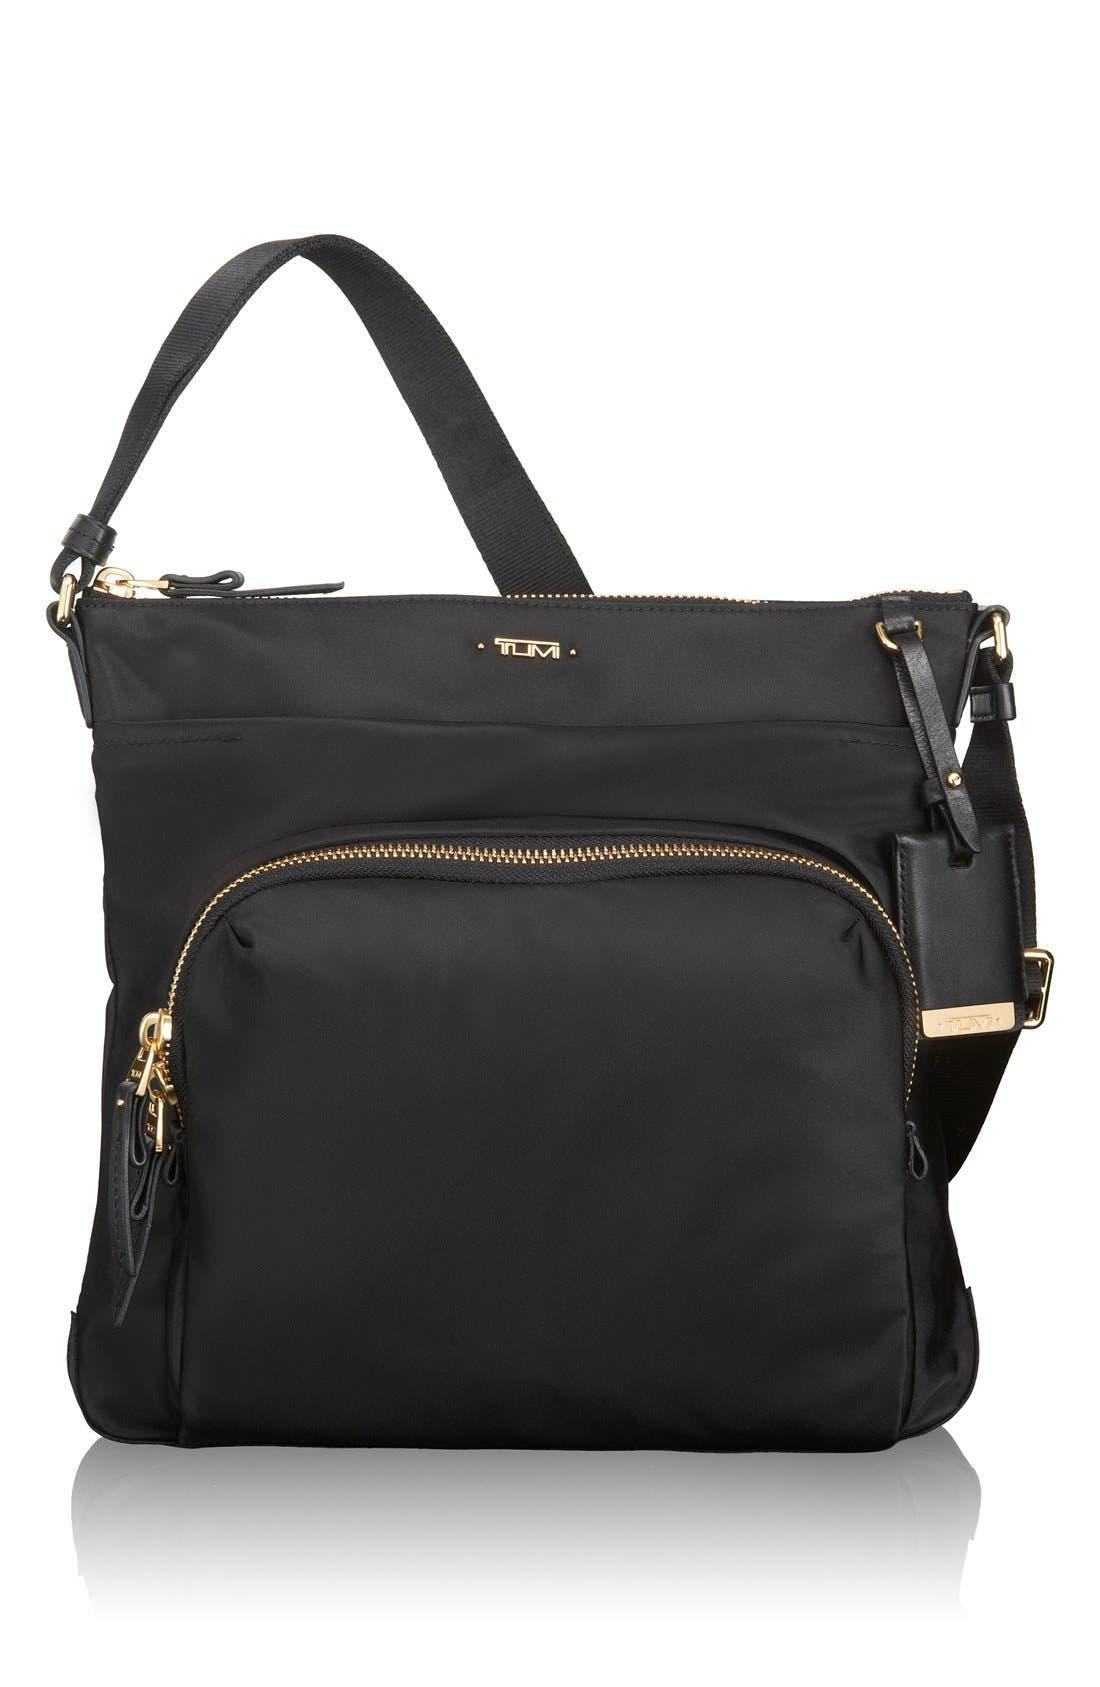 Alternate Image 1 Selected - Tumi 'Voyageur - Capri' Nylon Crossbody Bag